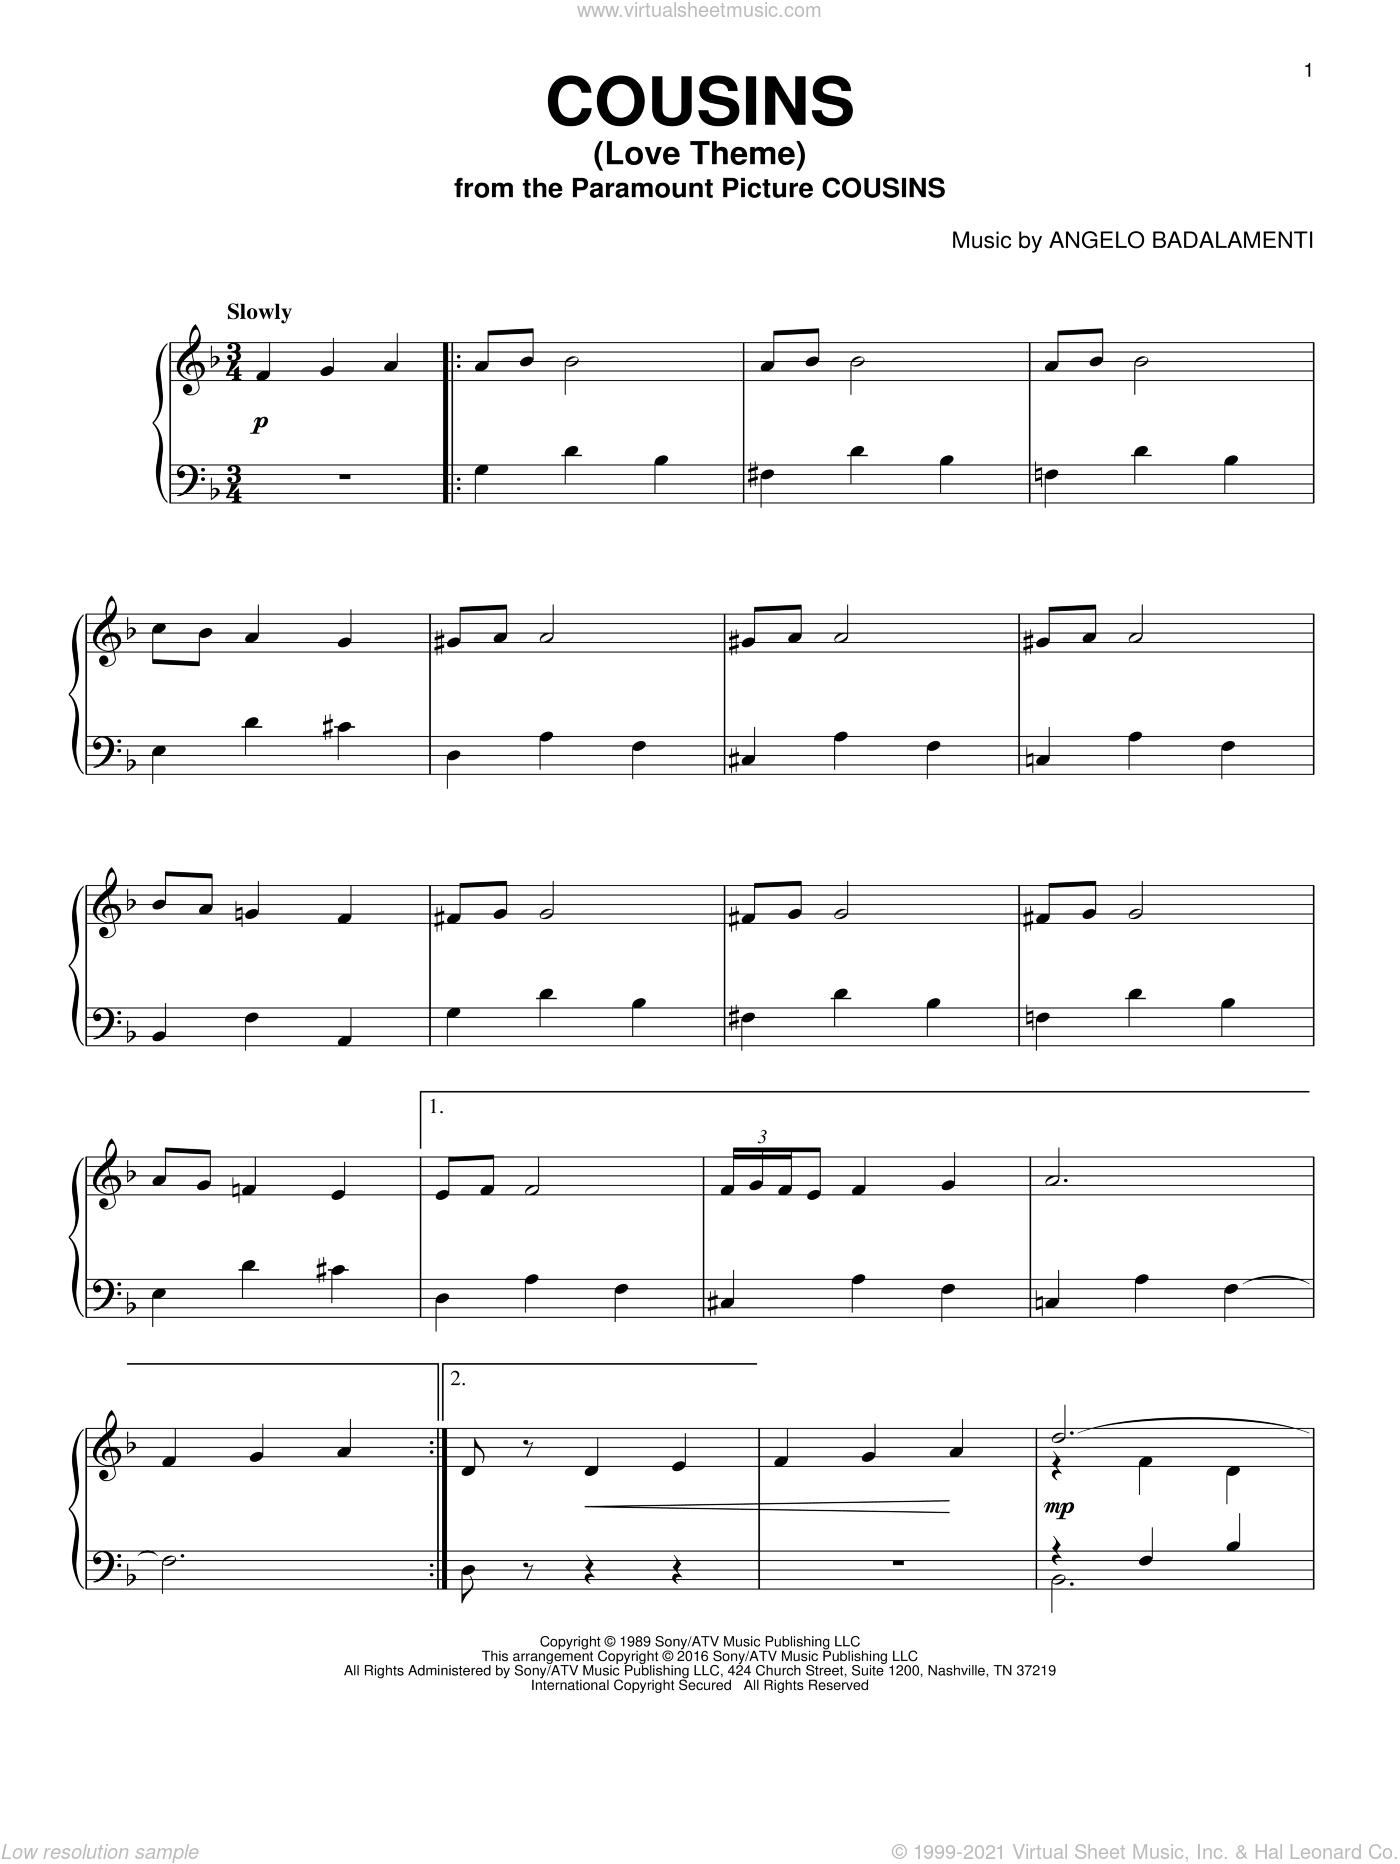 Cousins (Love Theme) sheet music for piano solo by Angelo Badalamenti, intermediate skill level